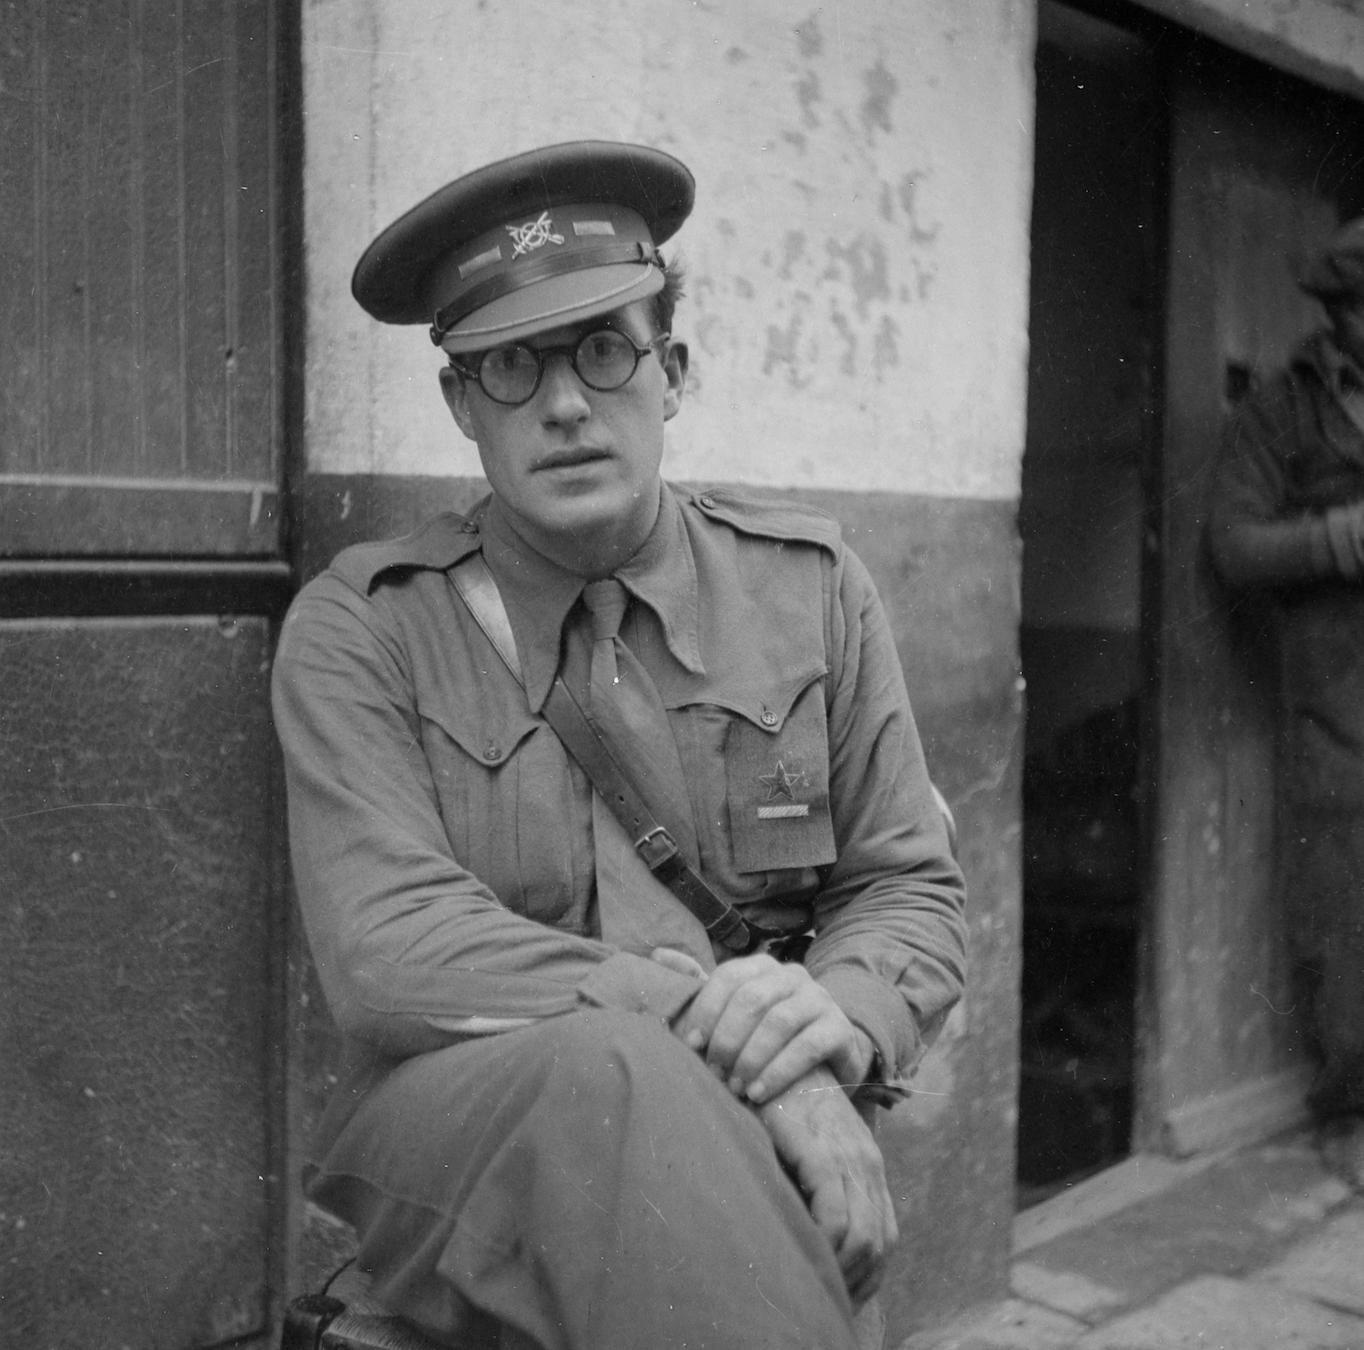 Robert Merriman, (Tamiment Library, NYU, 15th IB Photo Collection, Photo # 11-0634)